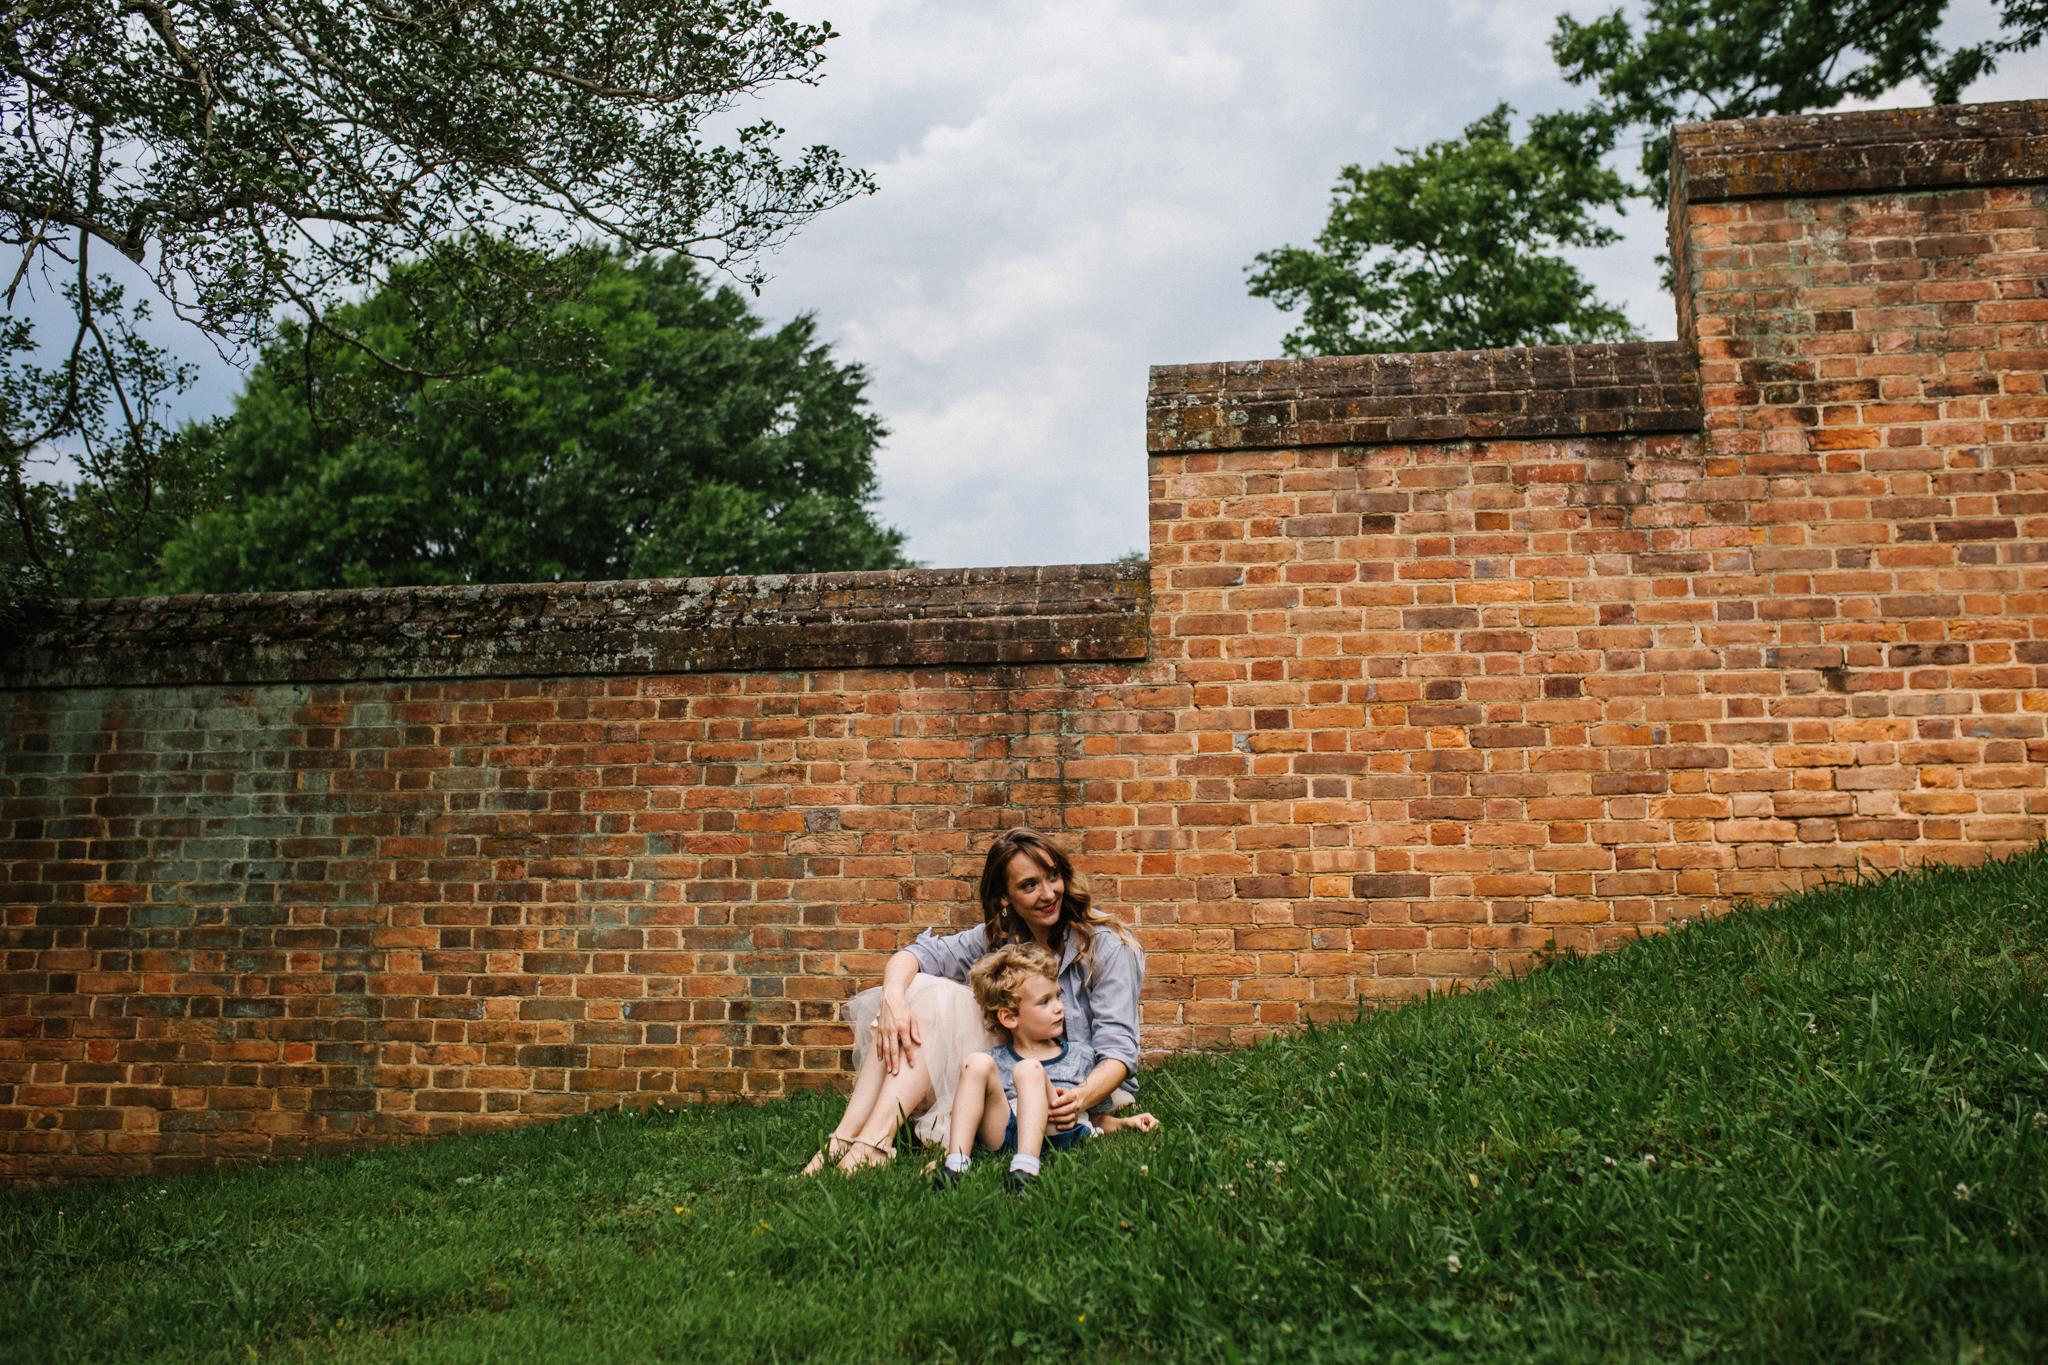 Nicoleandjack_colonialwilliamsburg_mommyandme_meadowsfrozencustard-59.jpg